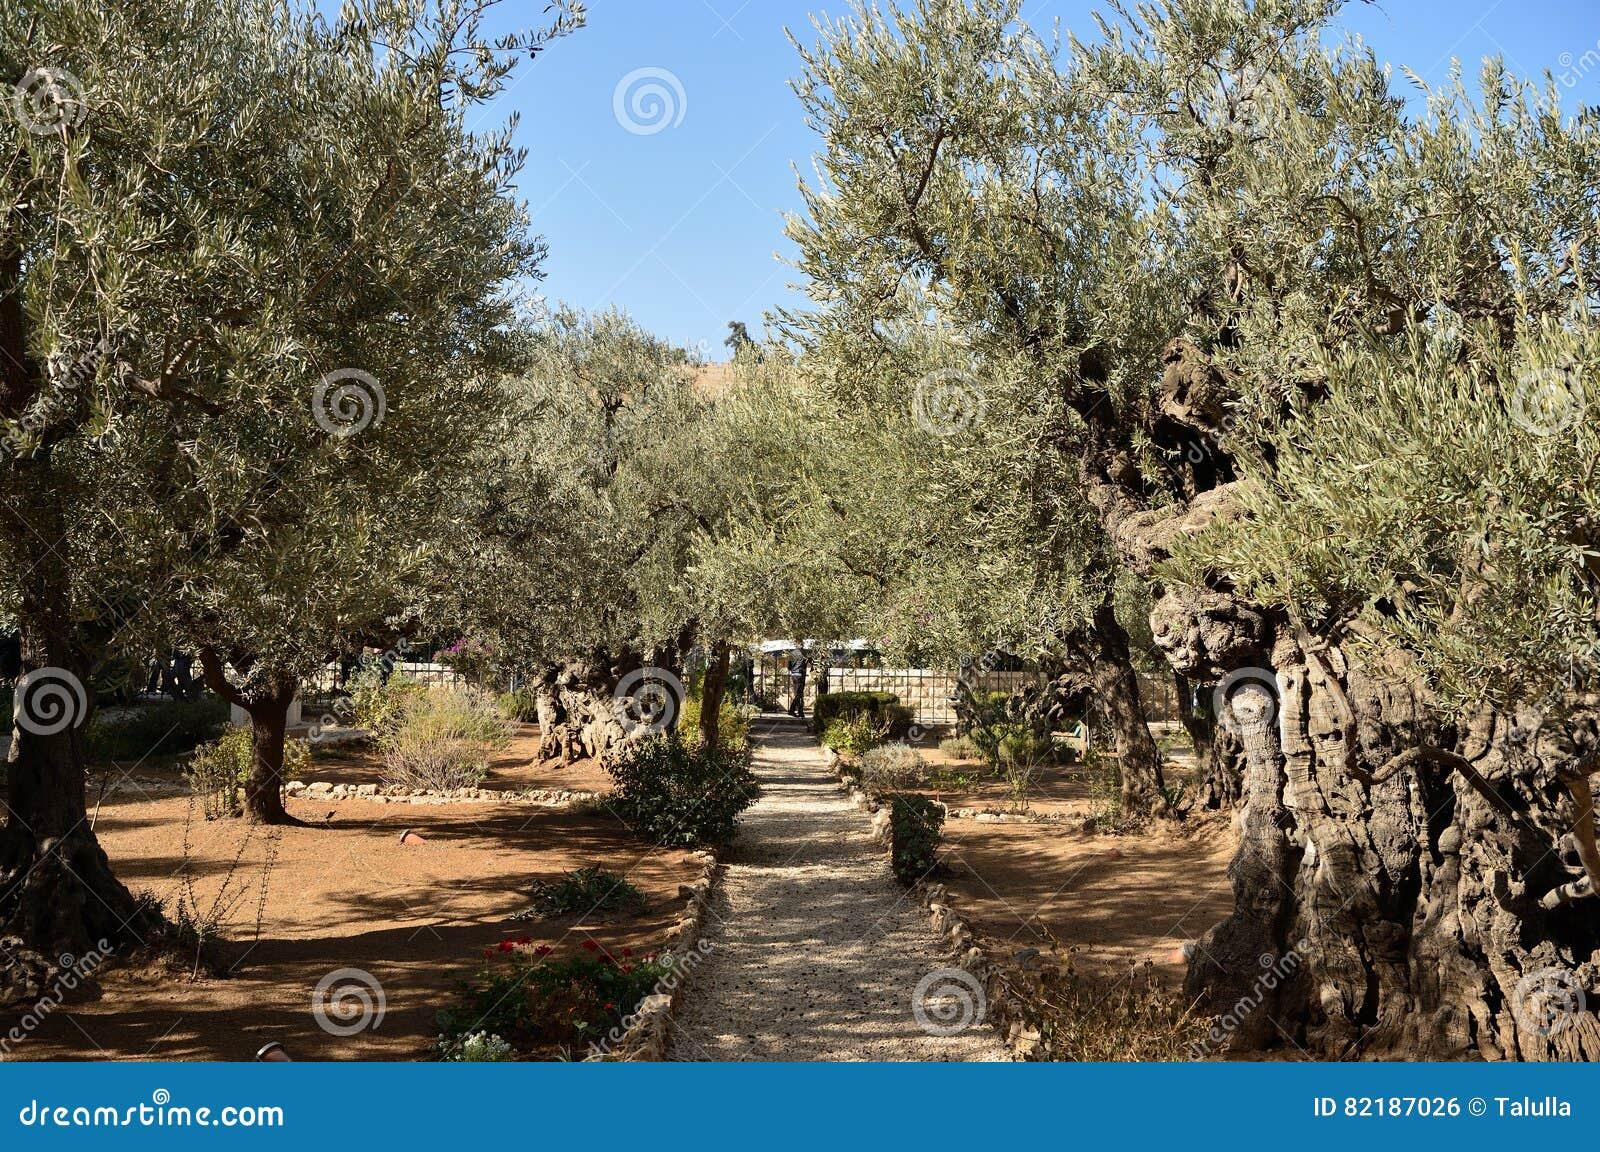 Olive Trees In The Garden Of Gethsemane, Jerusalem Stock Photo ...